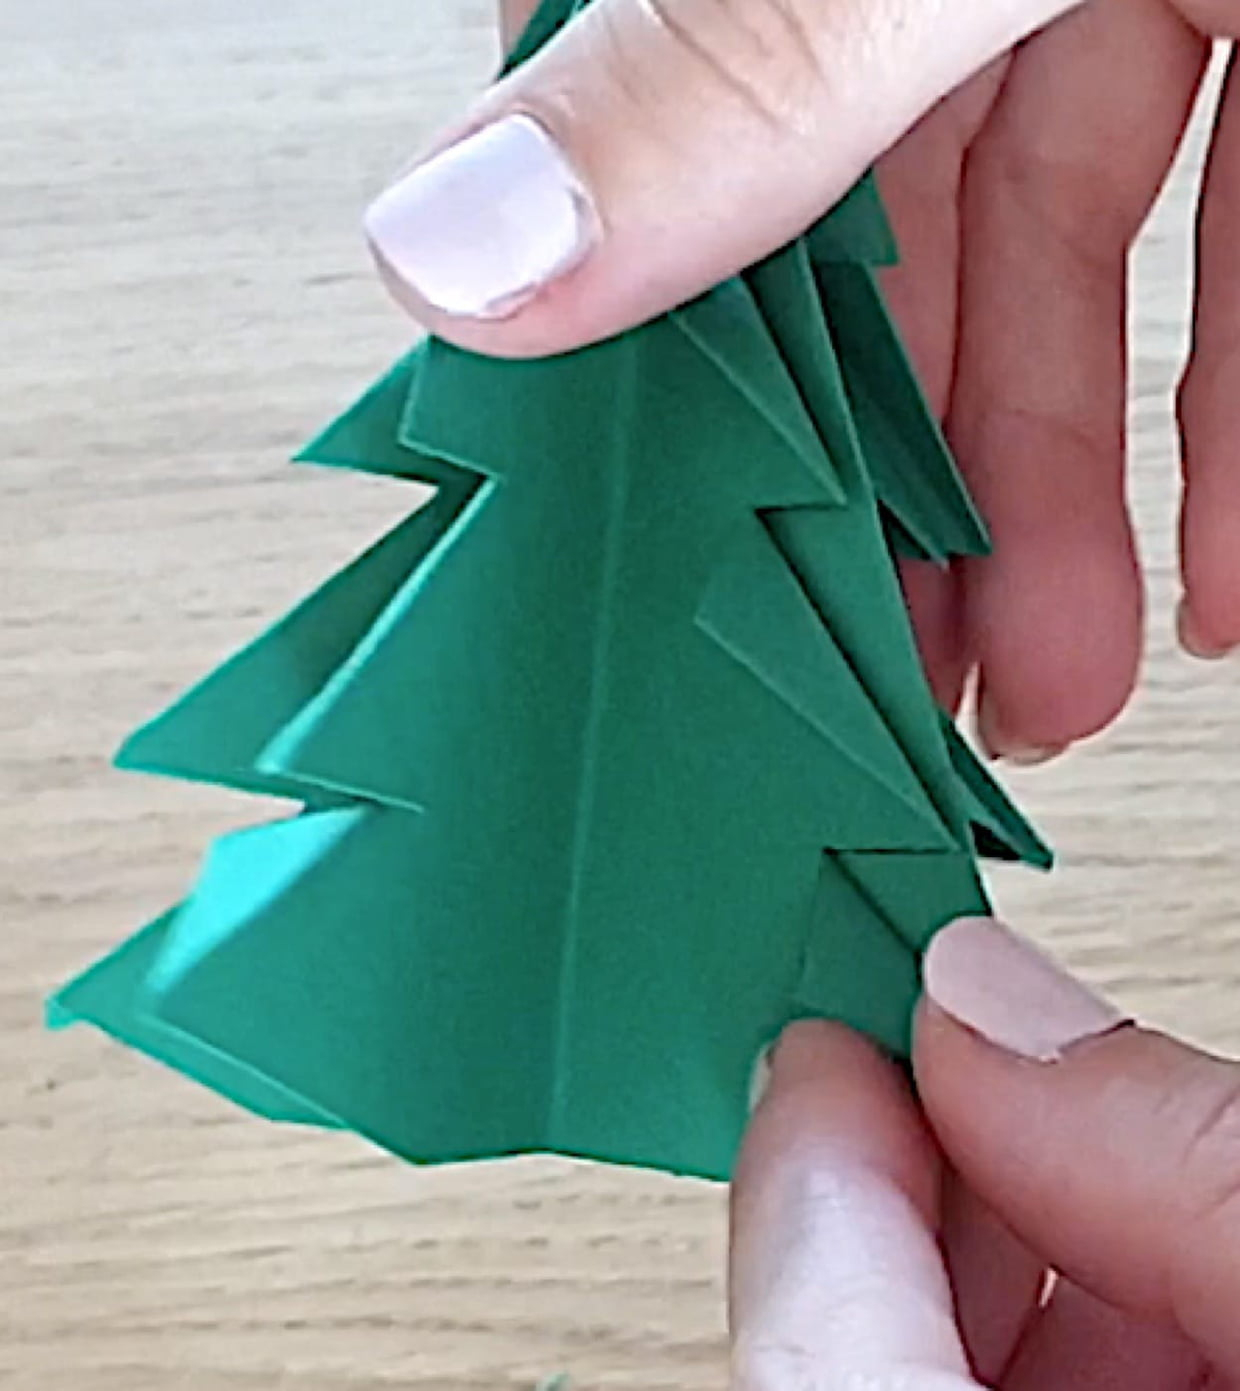 Sapin De Noël En Origami, Pliage Papier [Video] à Origami Sapin De Noel